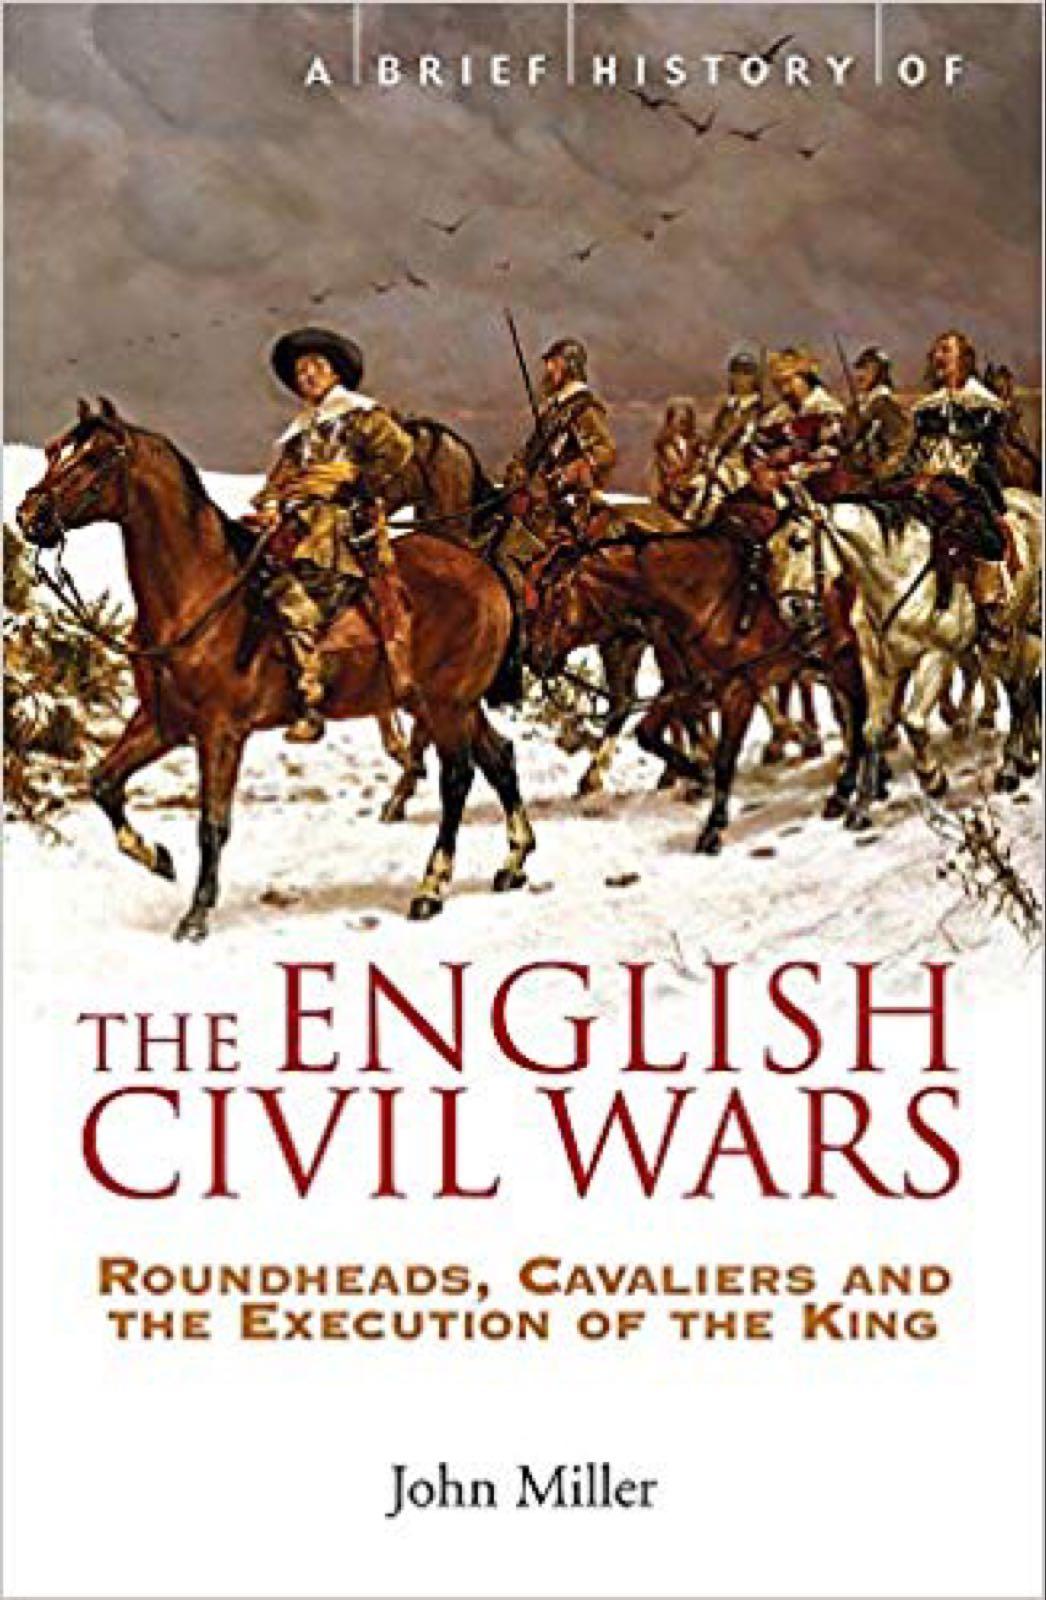 Book: A Brief History of the English Civil Wars (SKU: BK-FA-001)